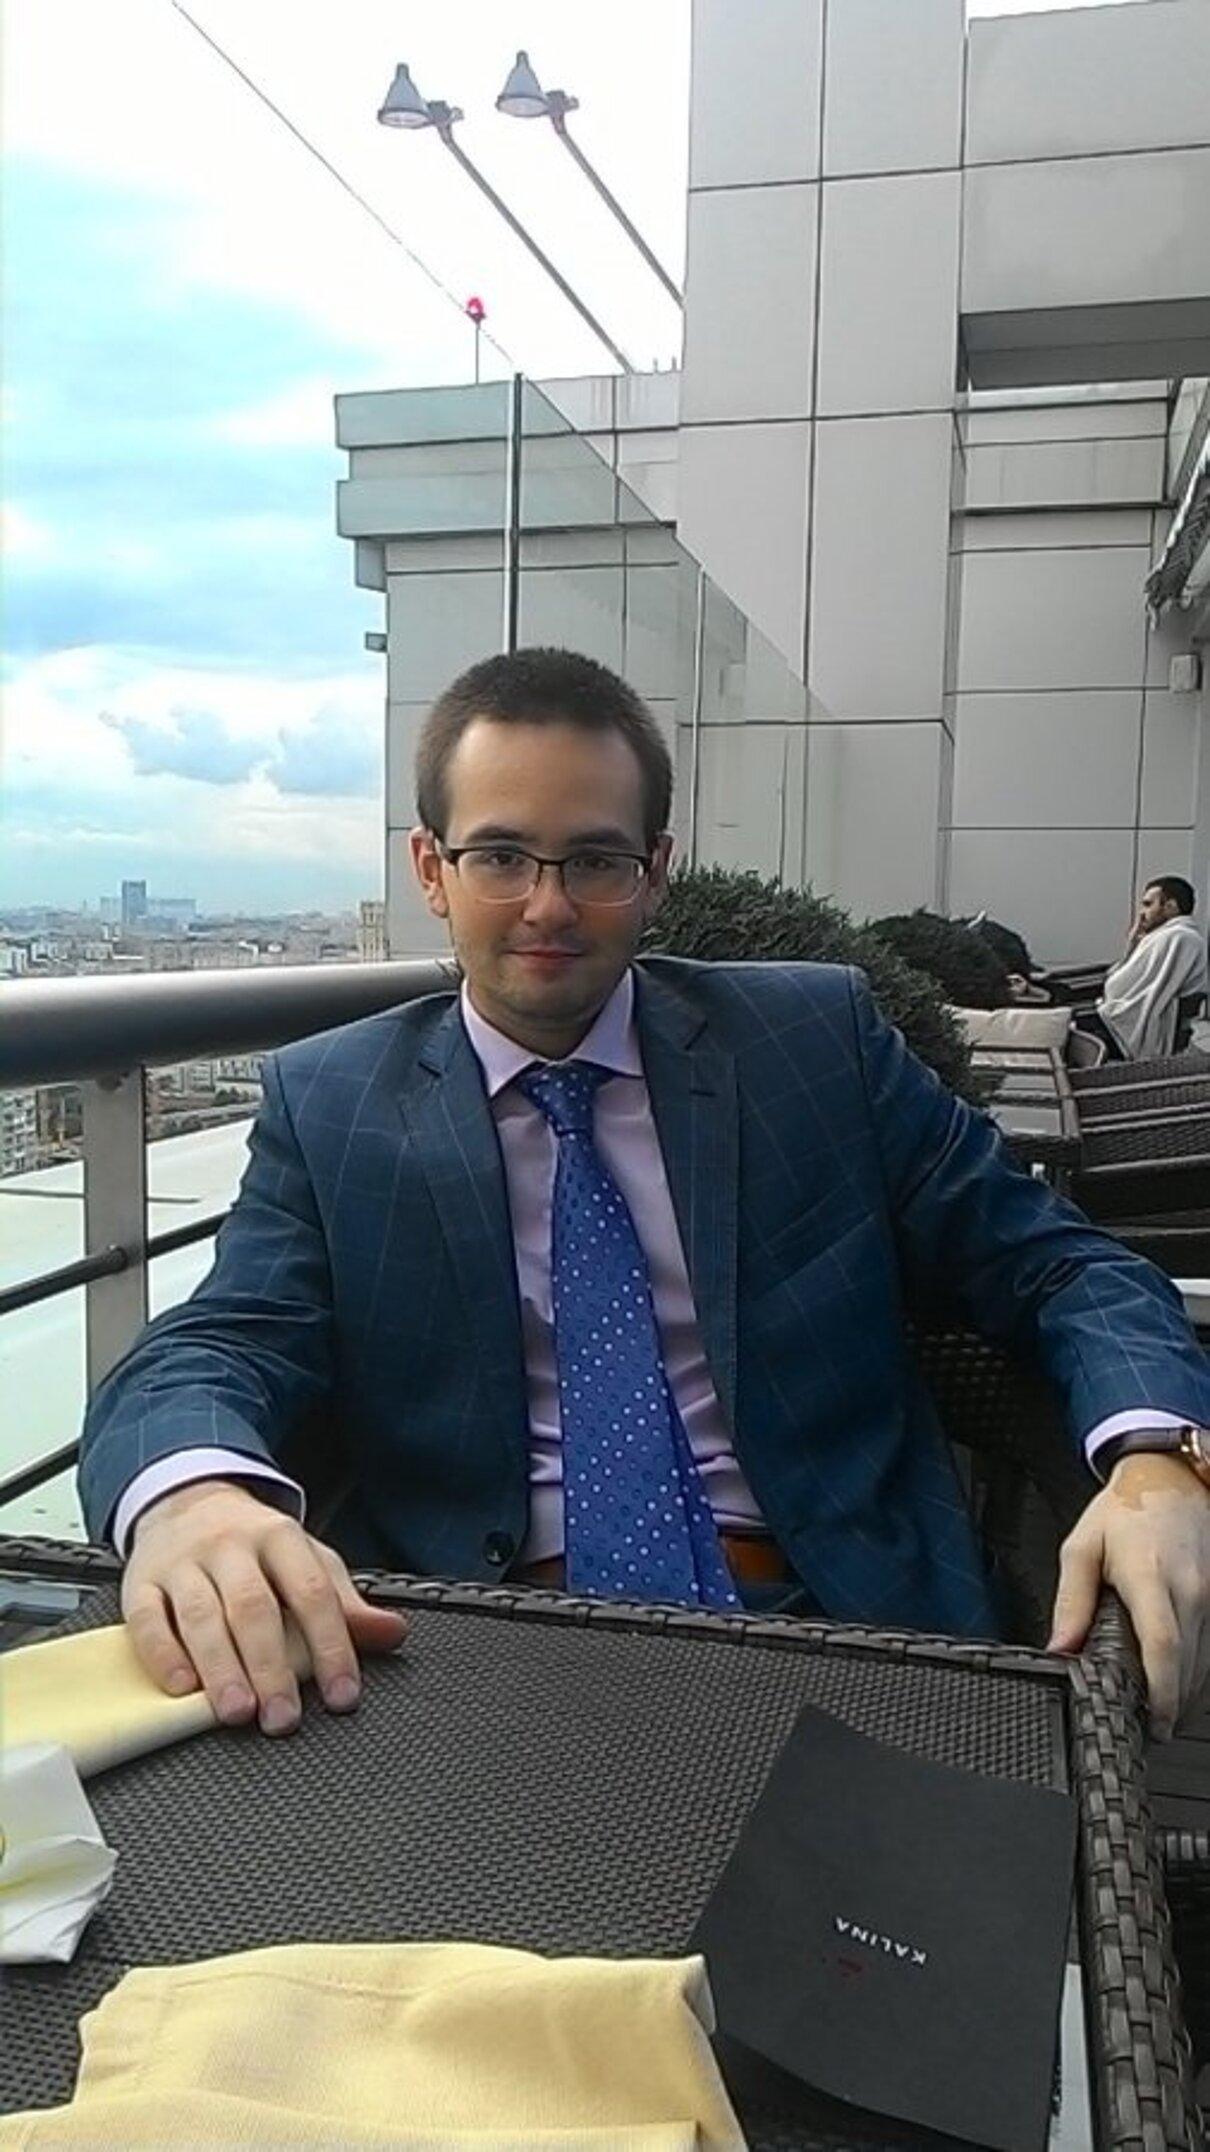 Жалоба-отзыв: Ерохин Александр Владимирович - Сотрудник, который принес убытки компании